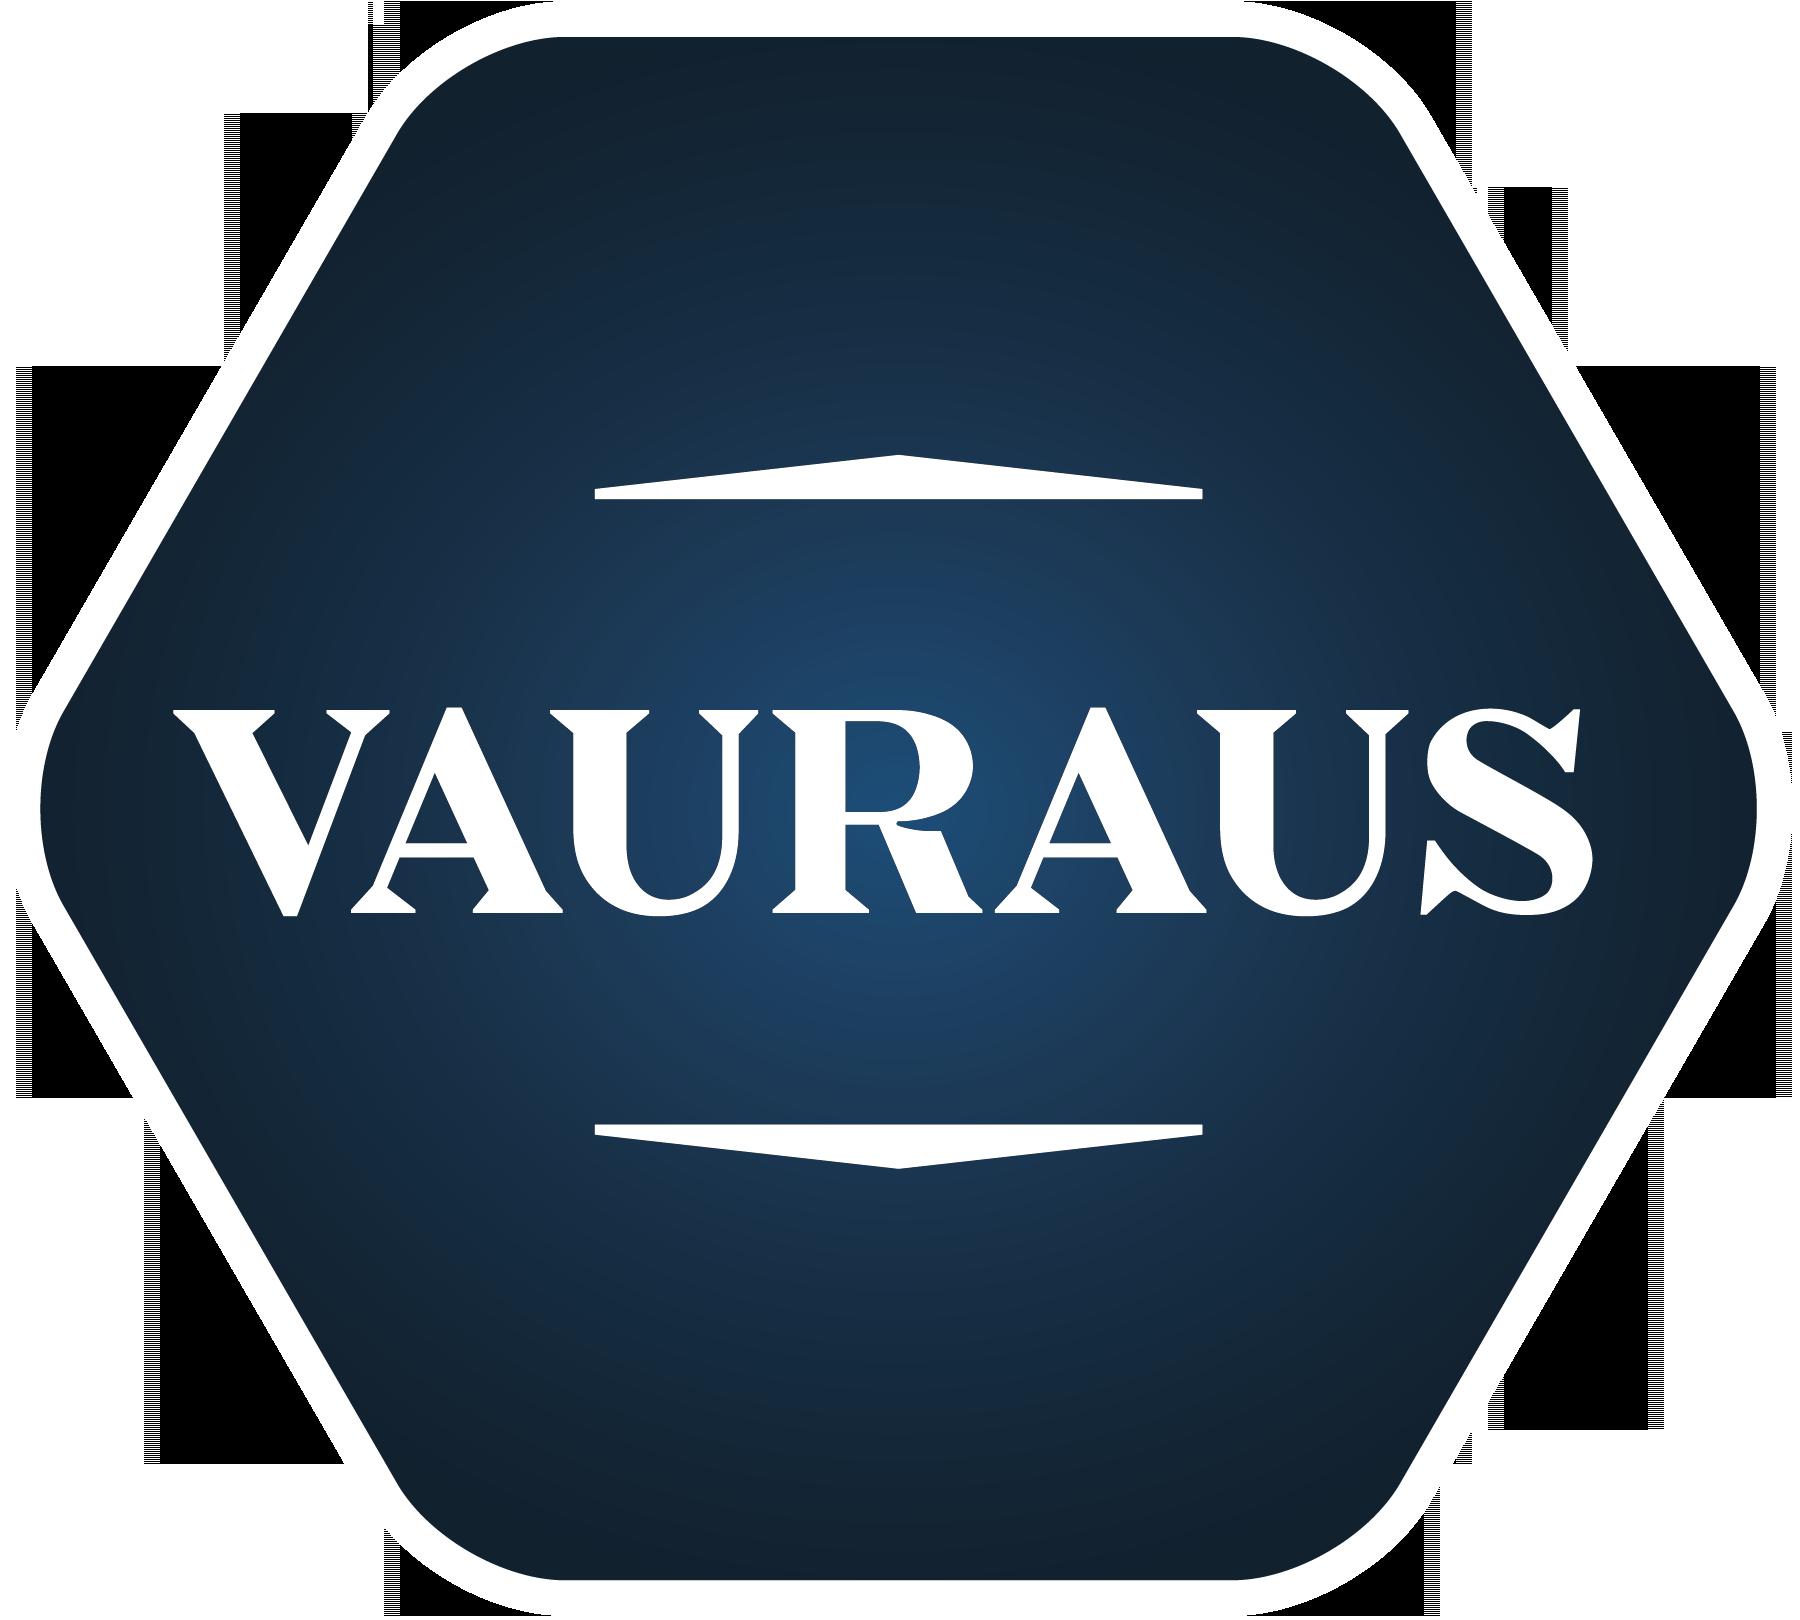 Vauraus